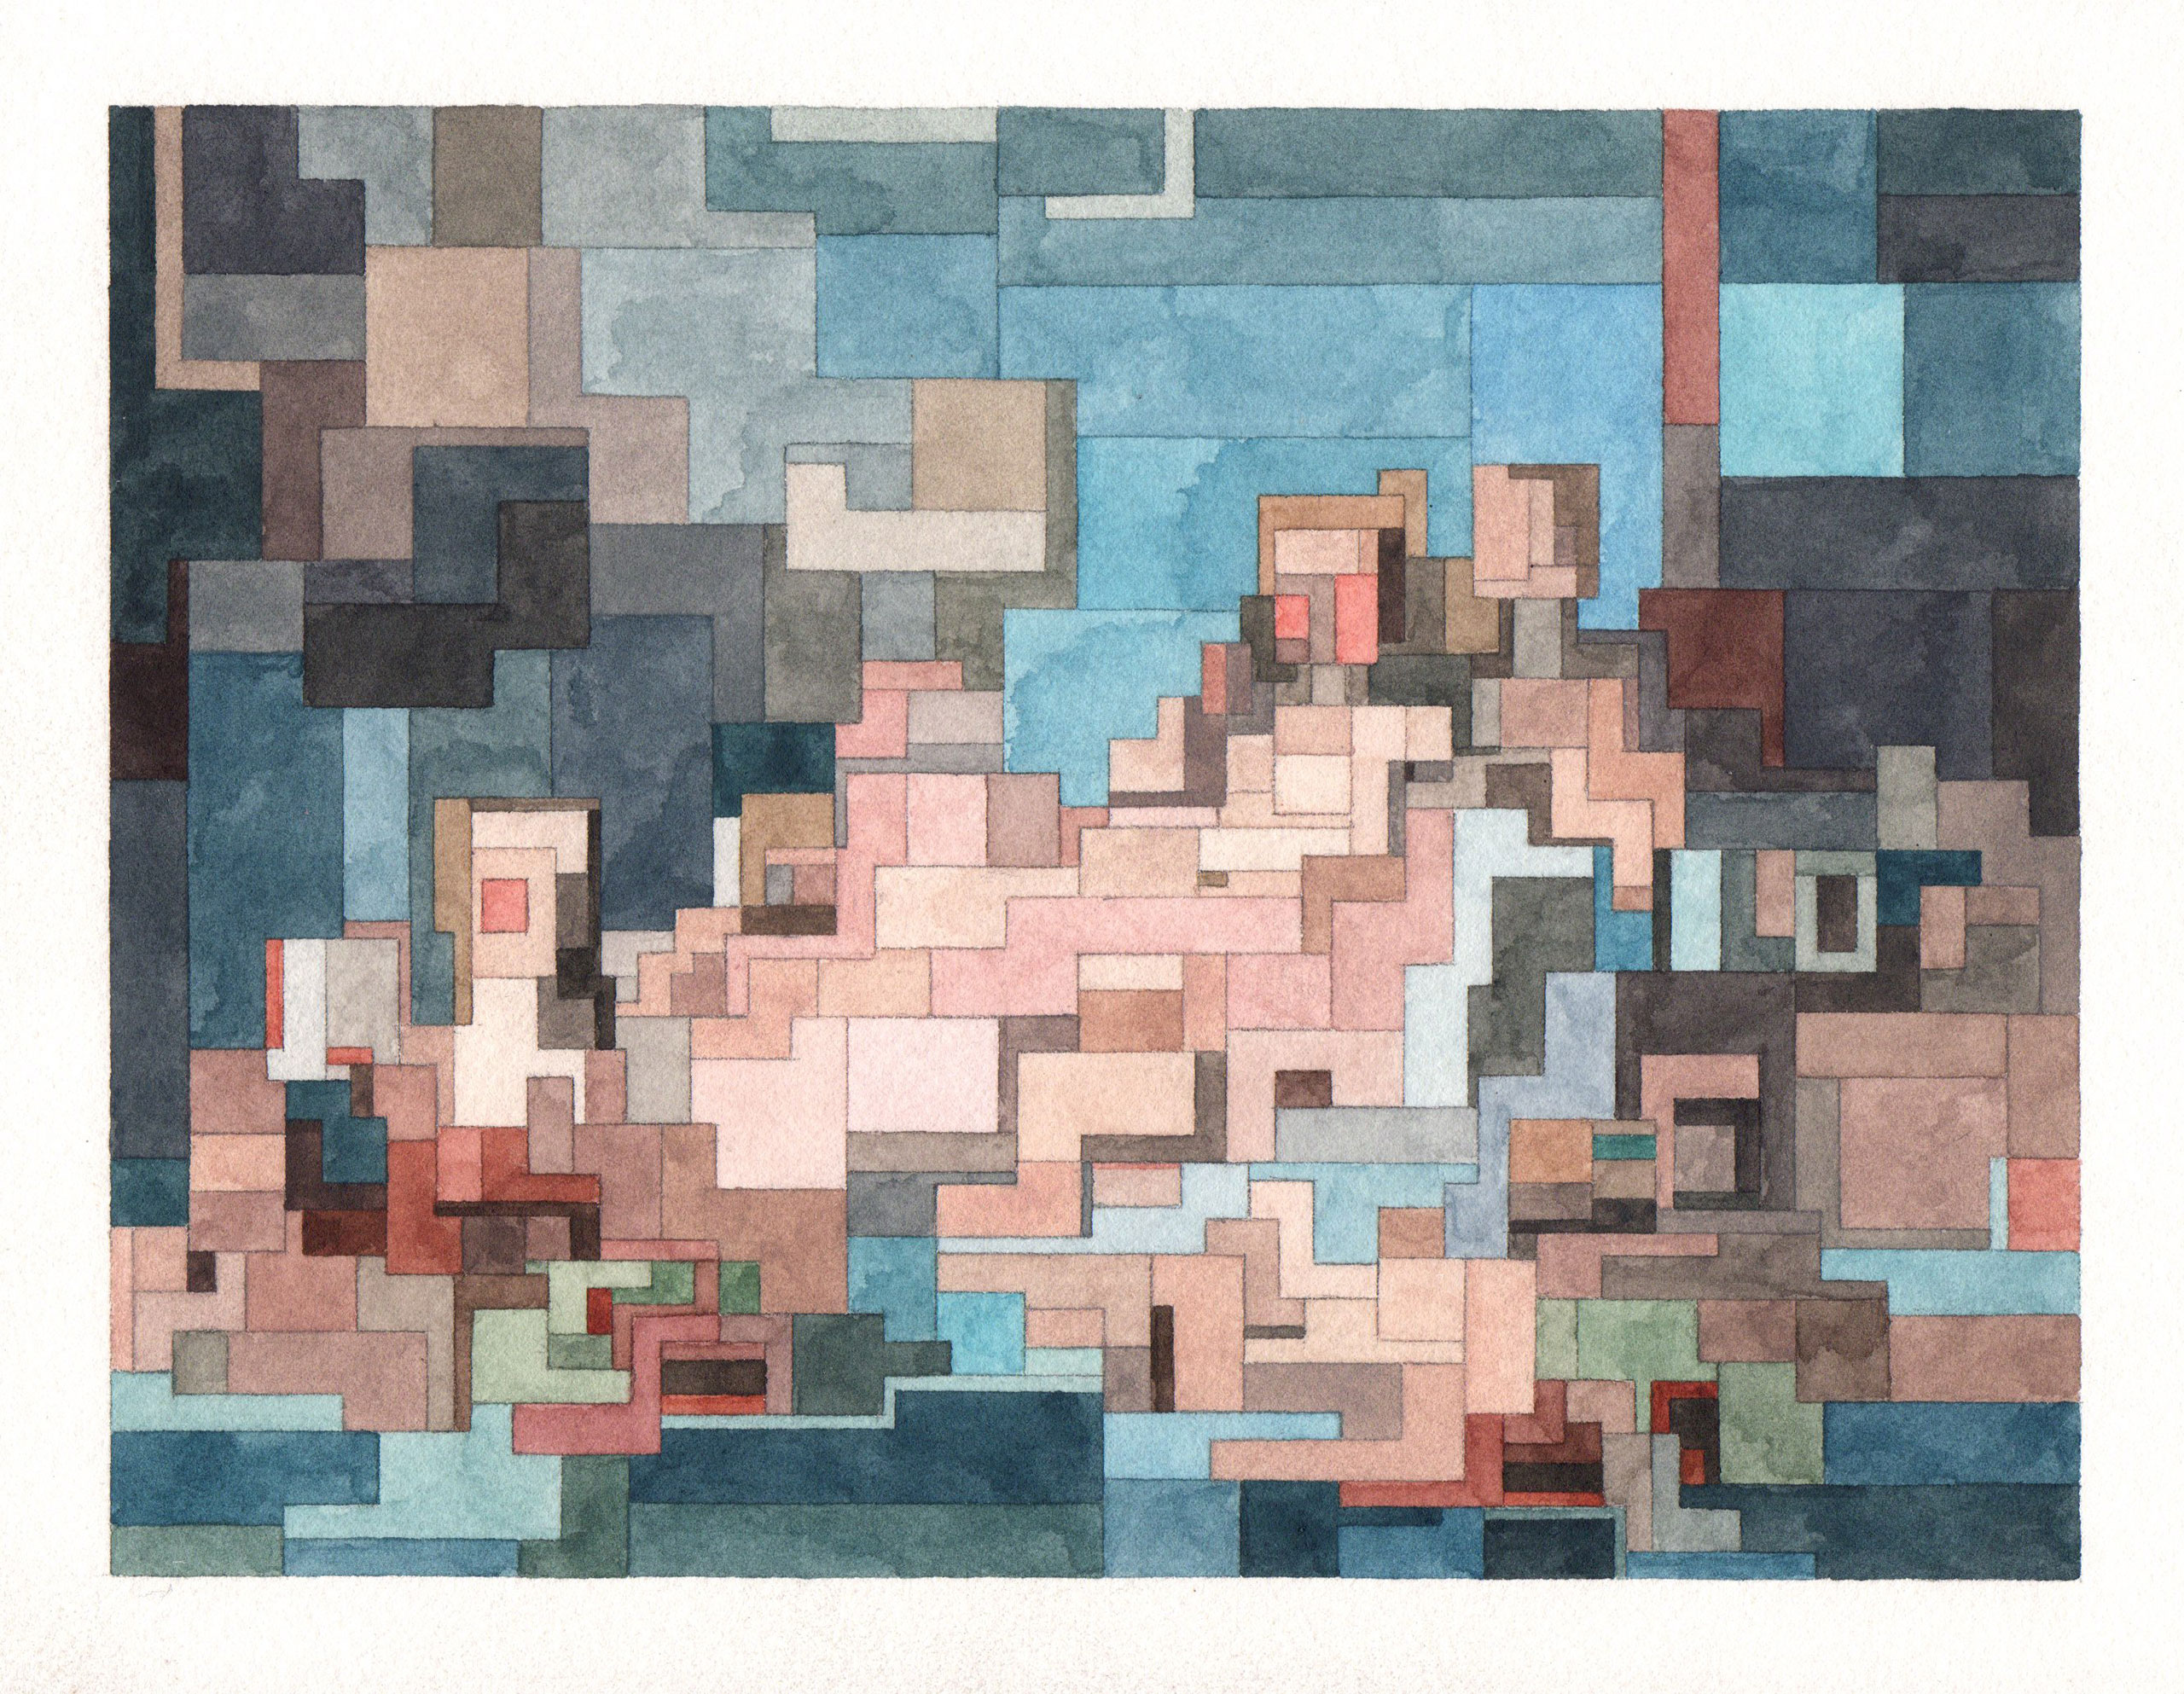 The Birth of Venus, Art History 101 series by Adam Lister.(Original Painting by Jean-Honoré Fragonard, 1753-5).